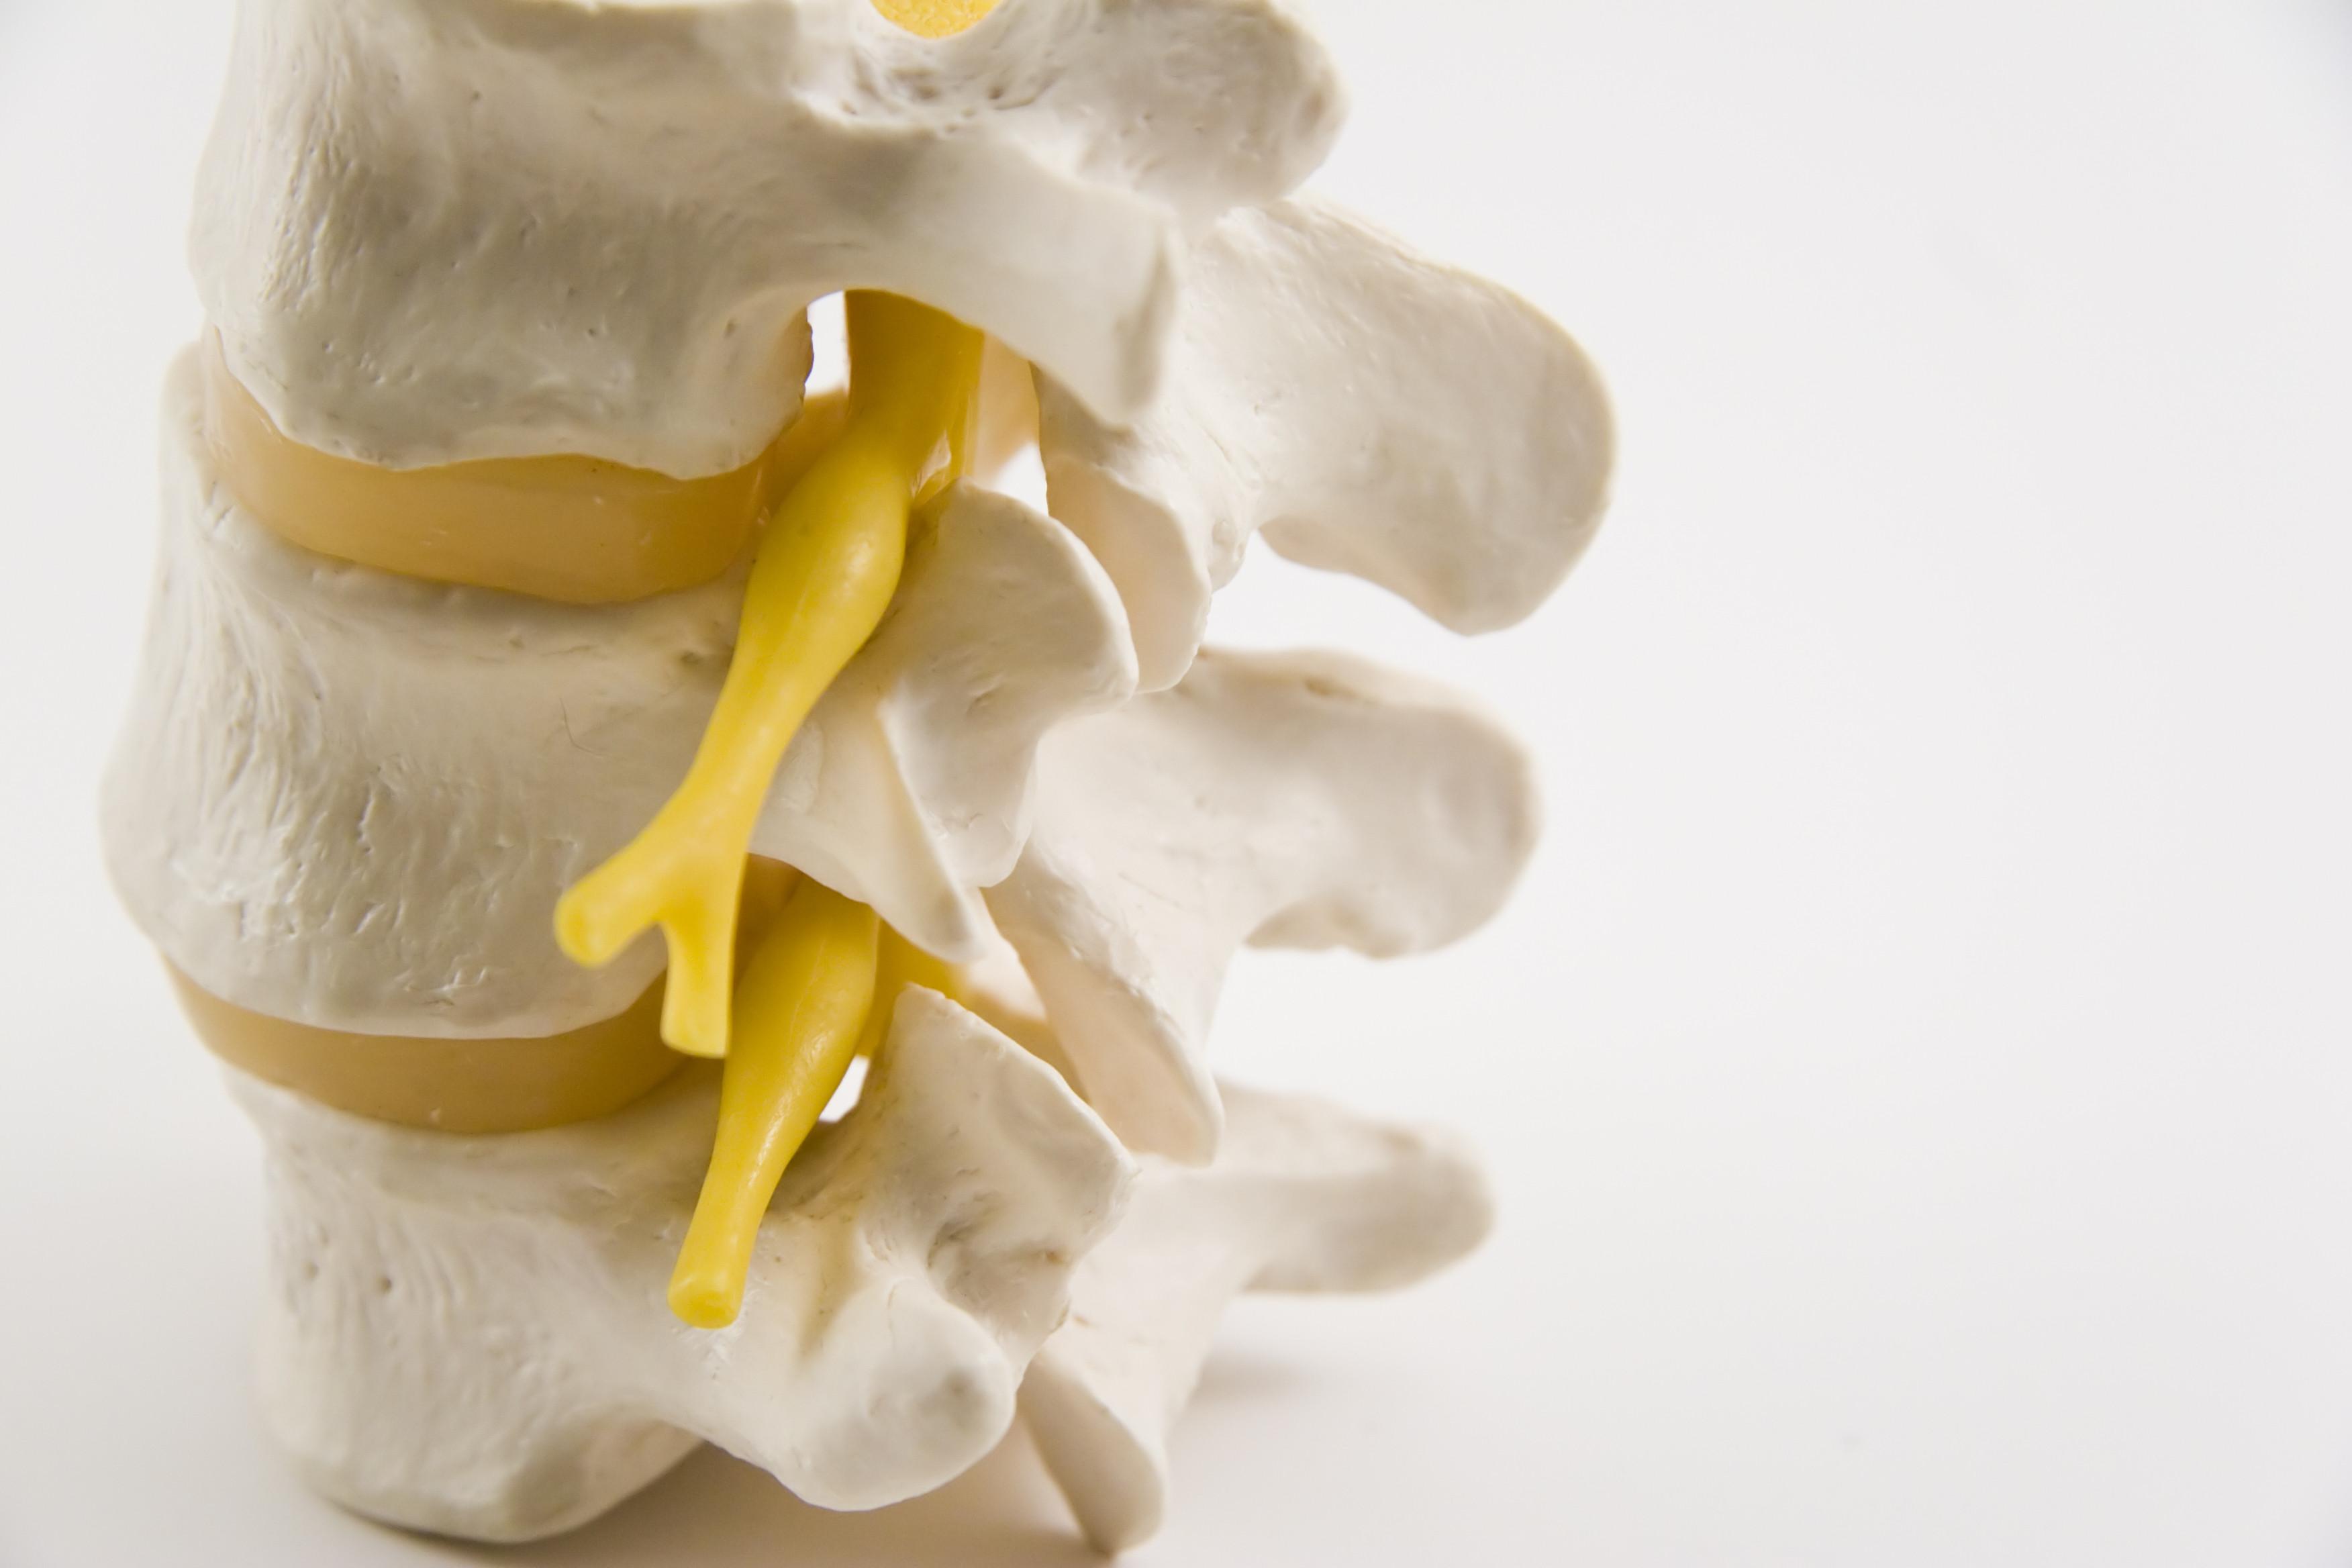 back-vertebrae-Piece-Of-Spine-391290